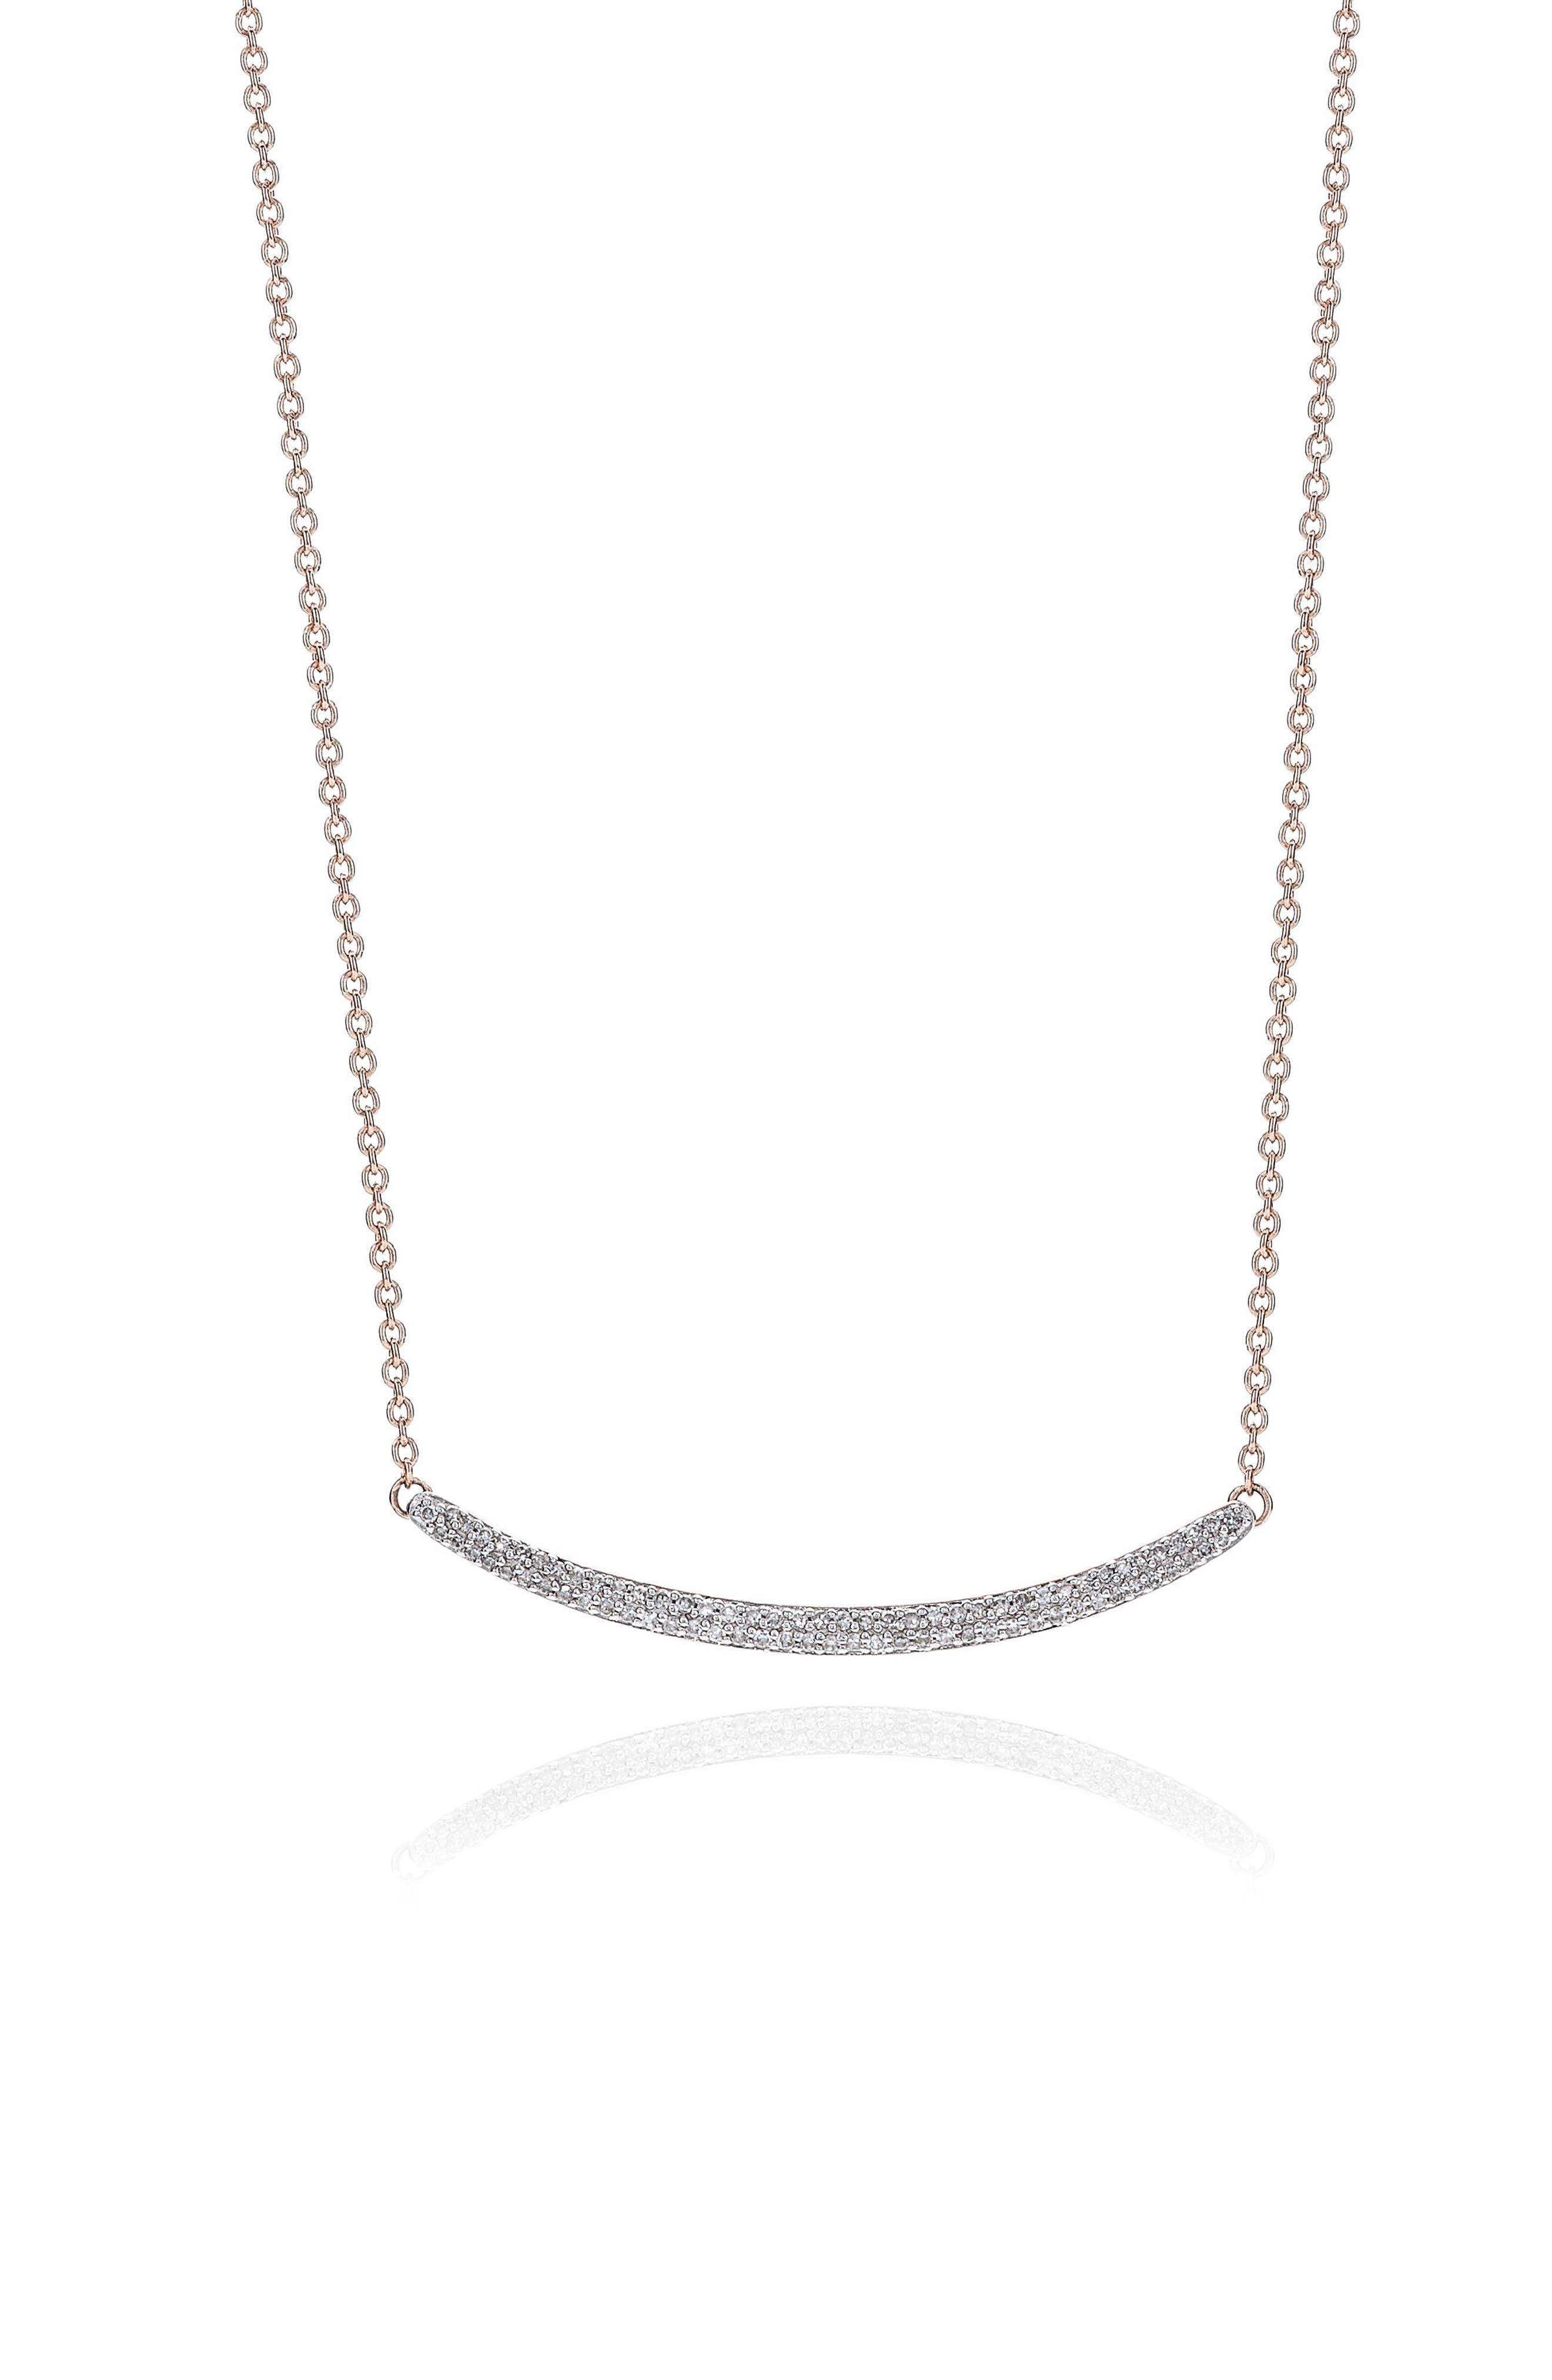 MONICA VINADER Skinny Diamond Necklace, Main, color, ROSE GOLD